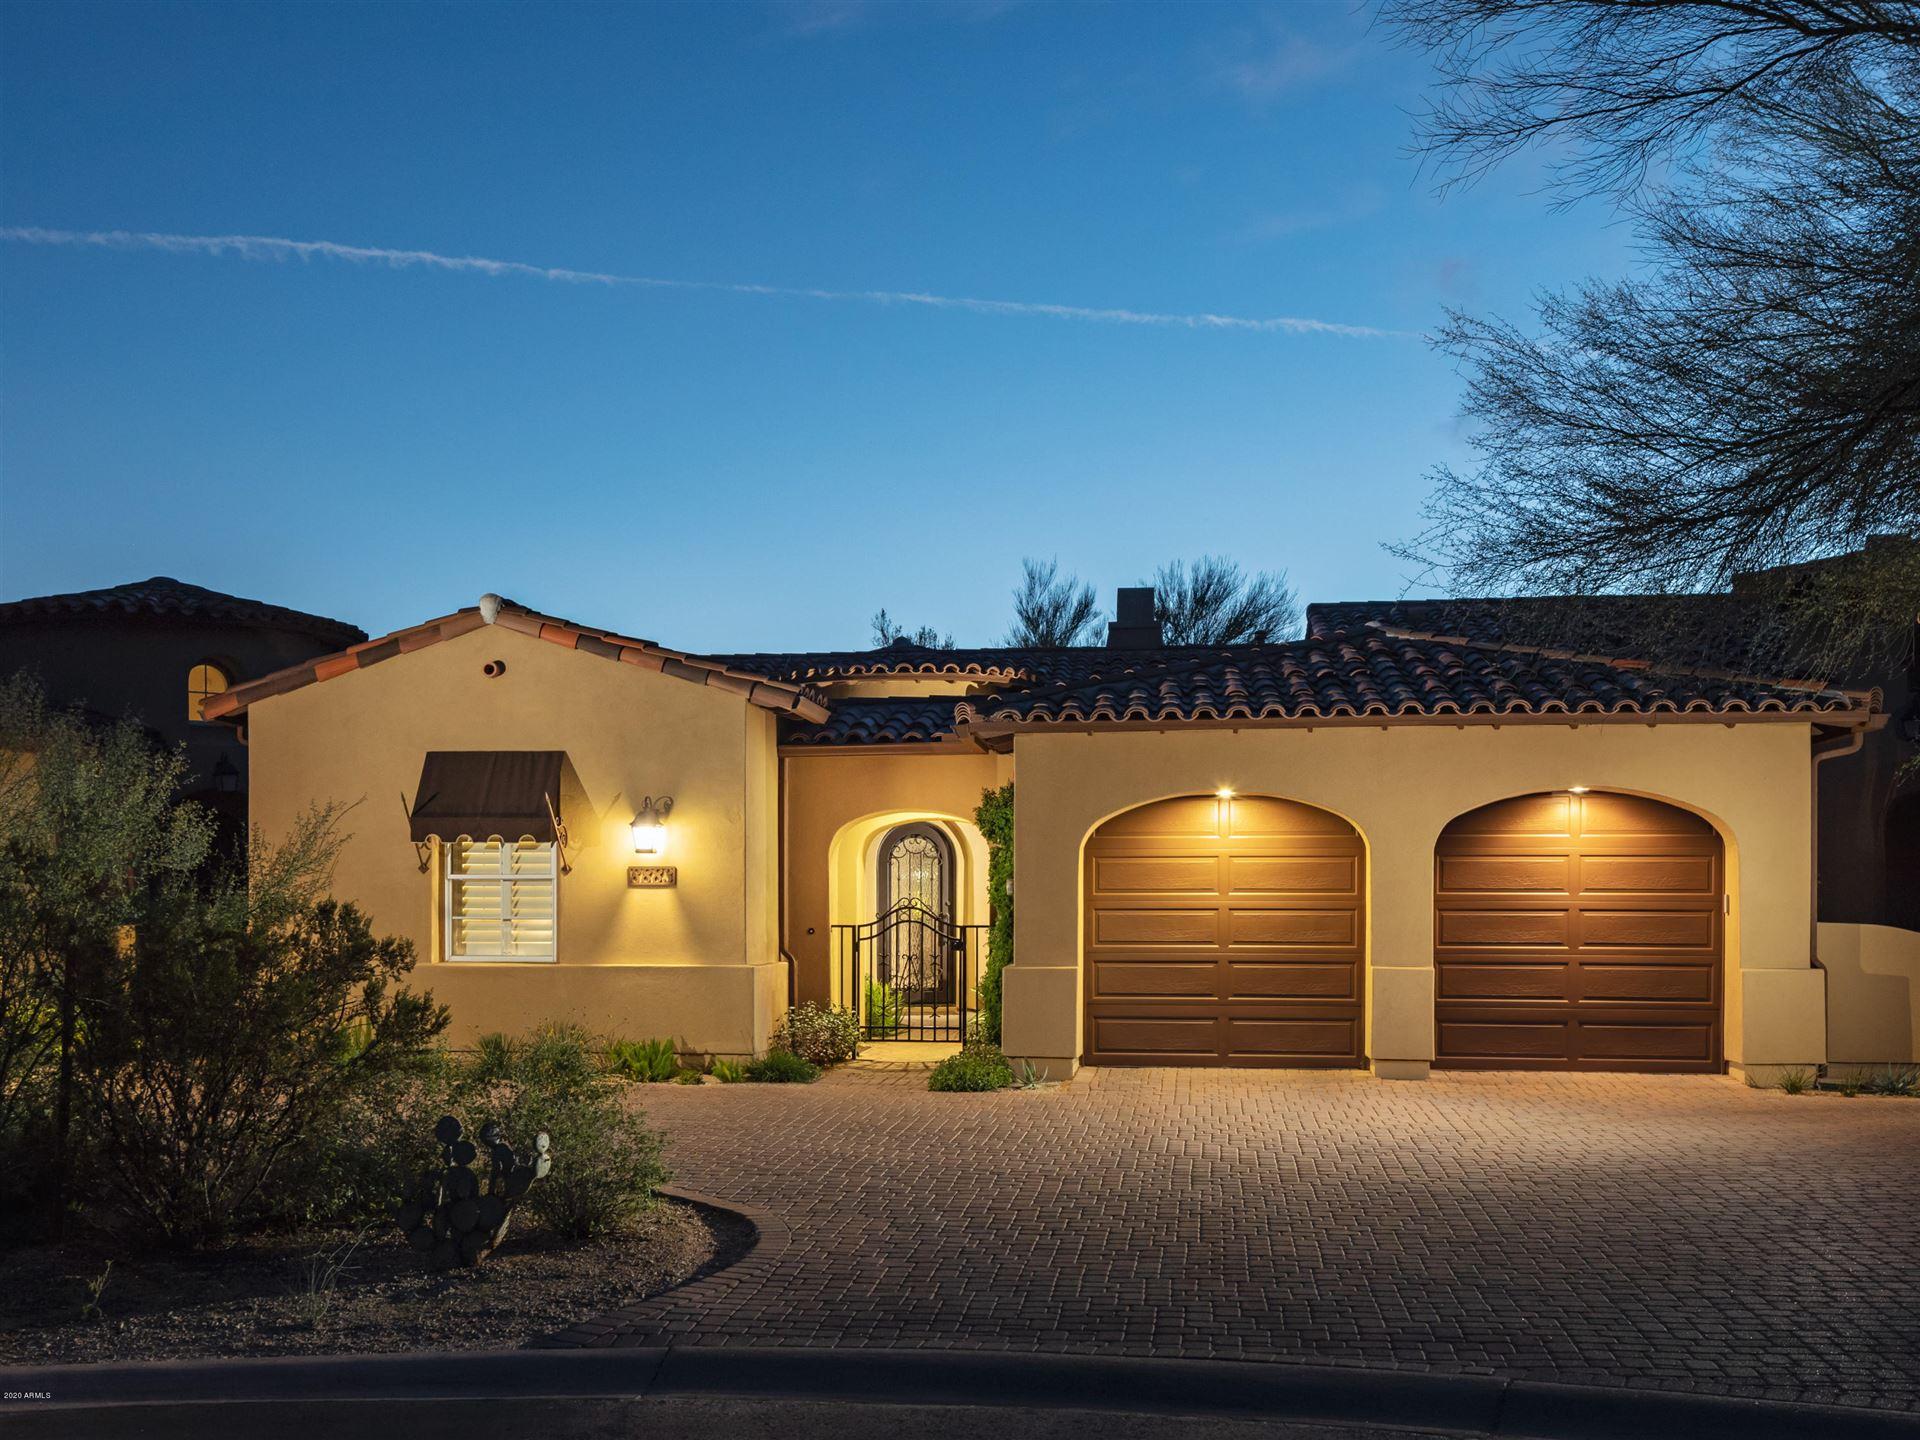 Photo of 8883 E RUSTY SPUR Place, Scottsdale, AZ 85255 (MLS # 6189684)